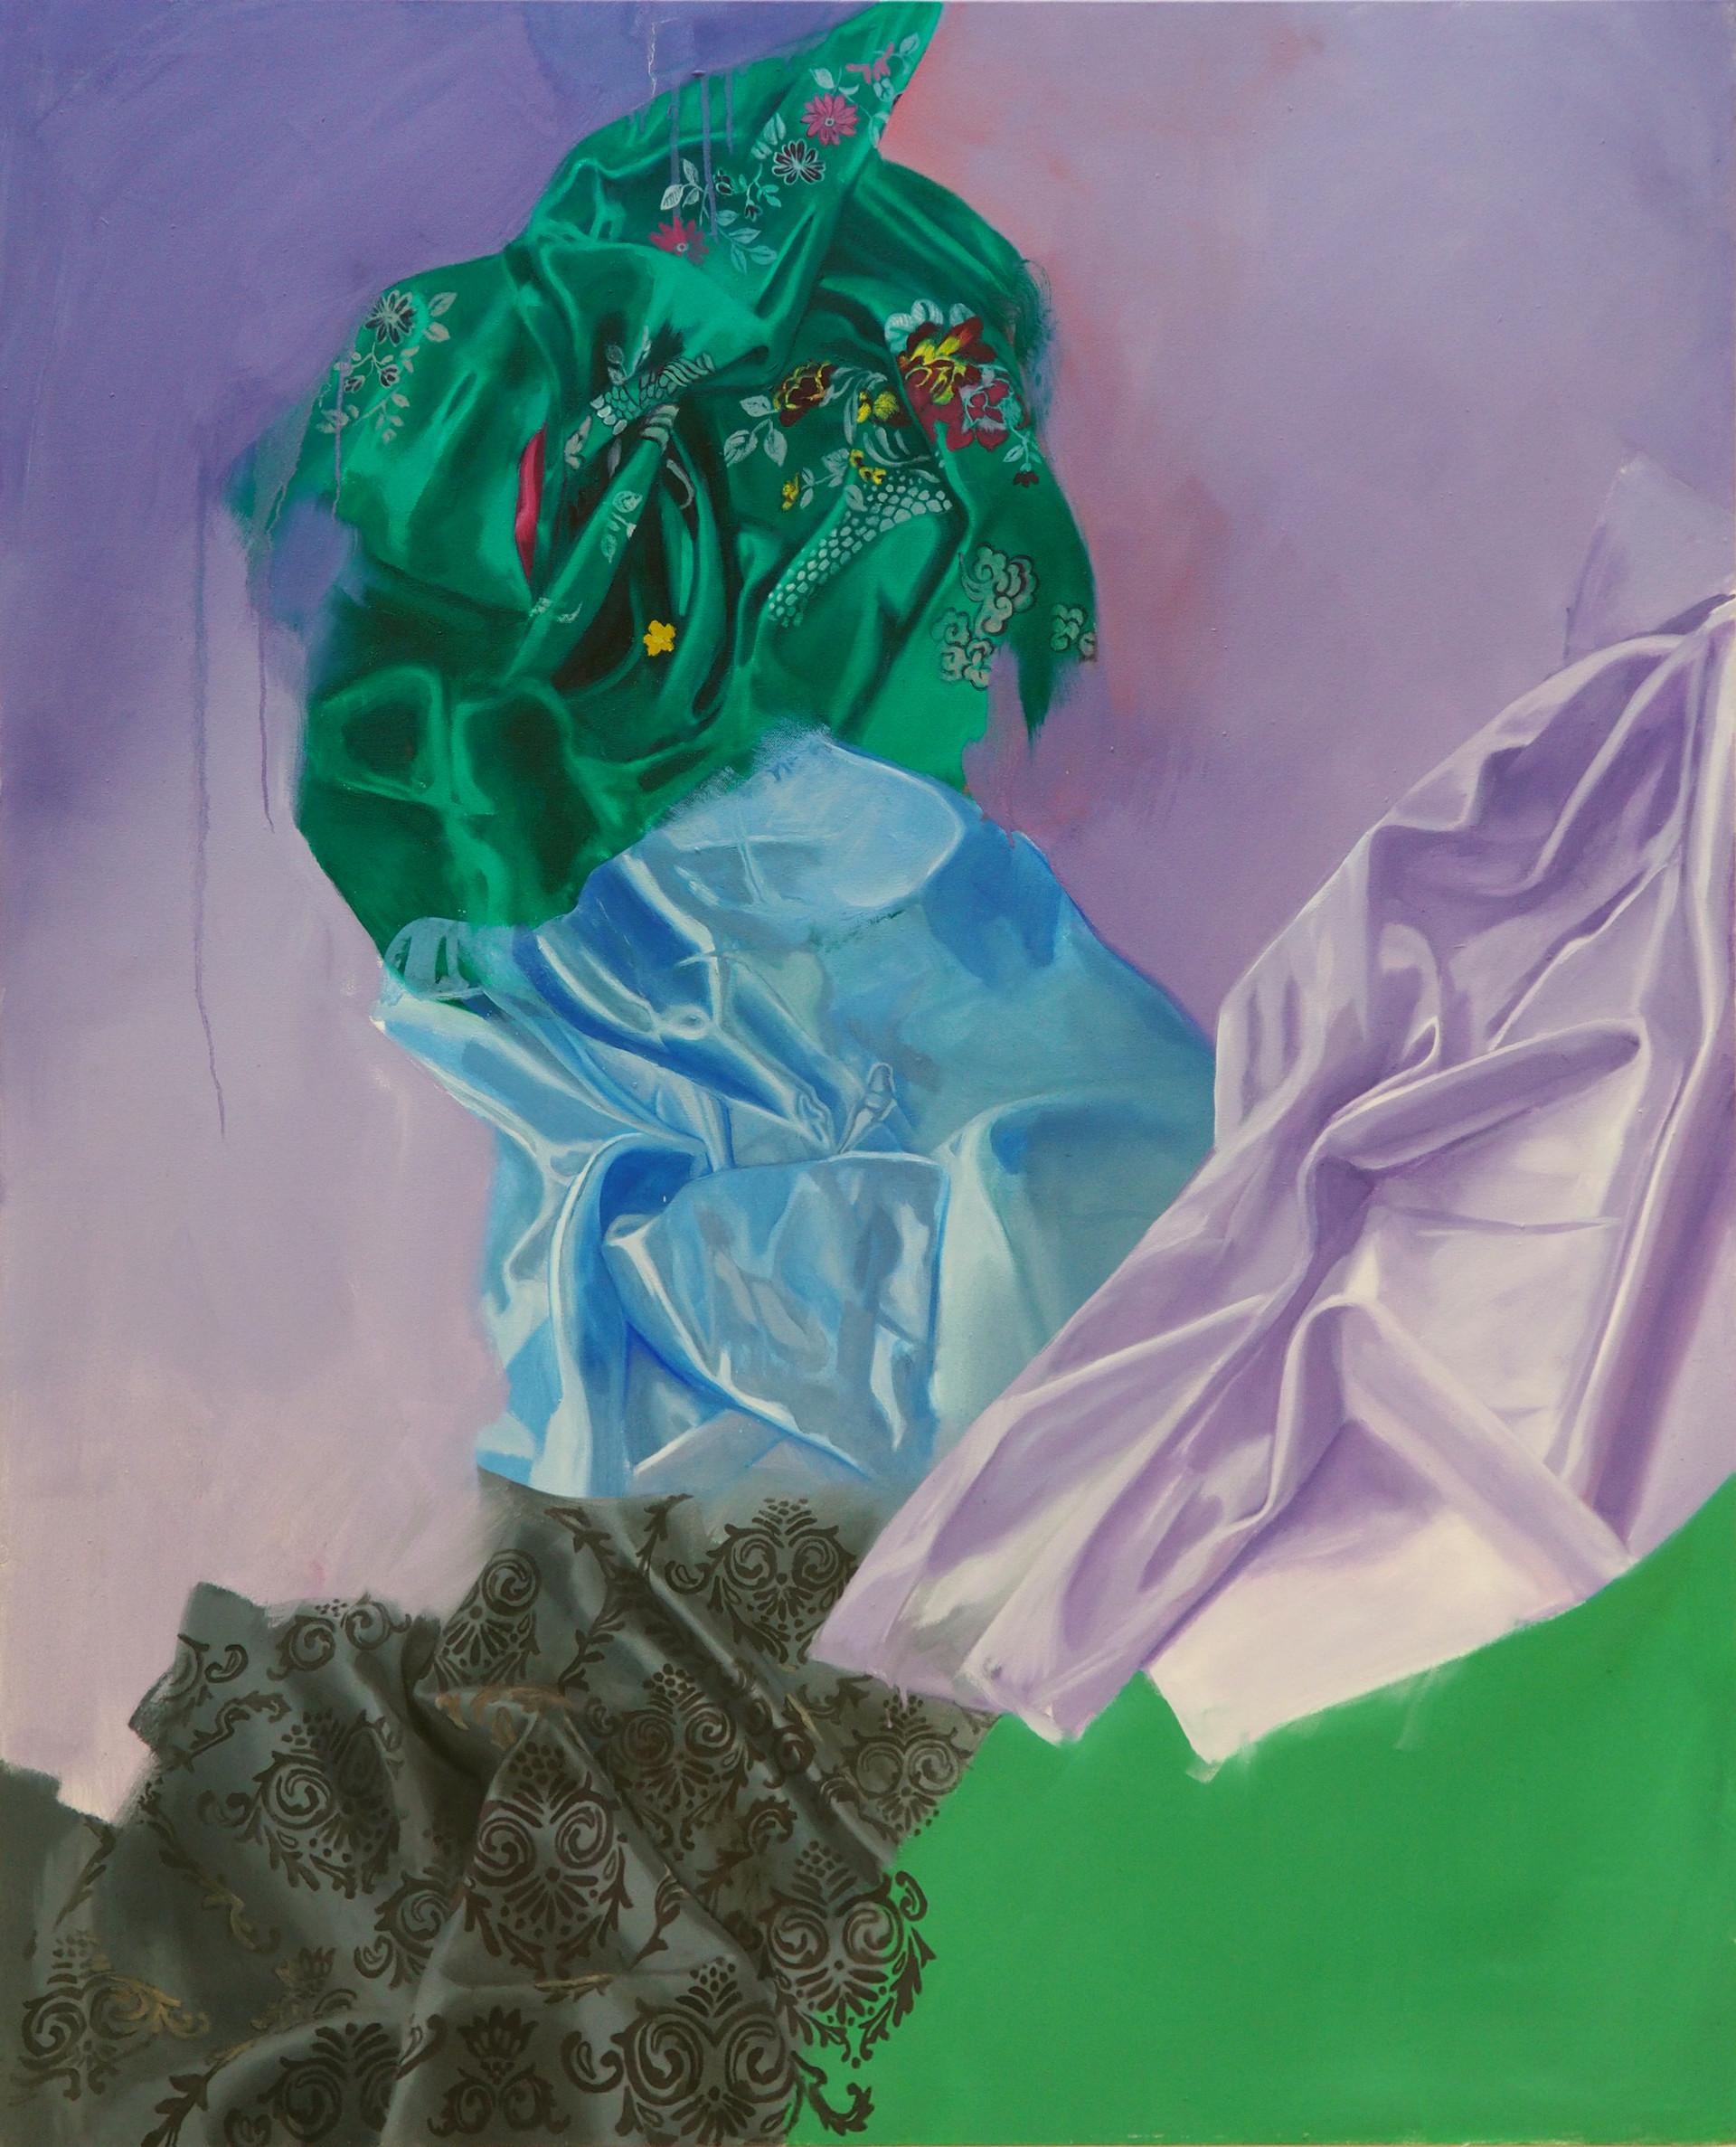 Folds & Patterns, Oil on canvas, 130 x 160 cm, 2019